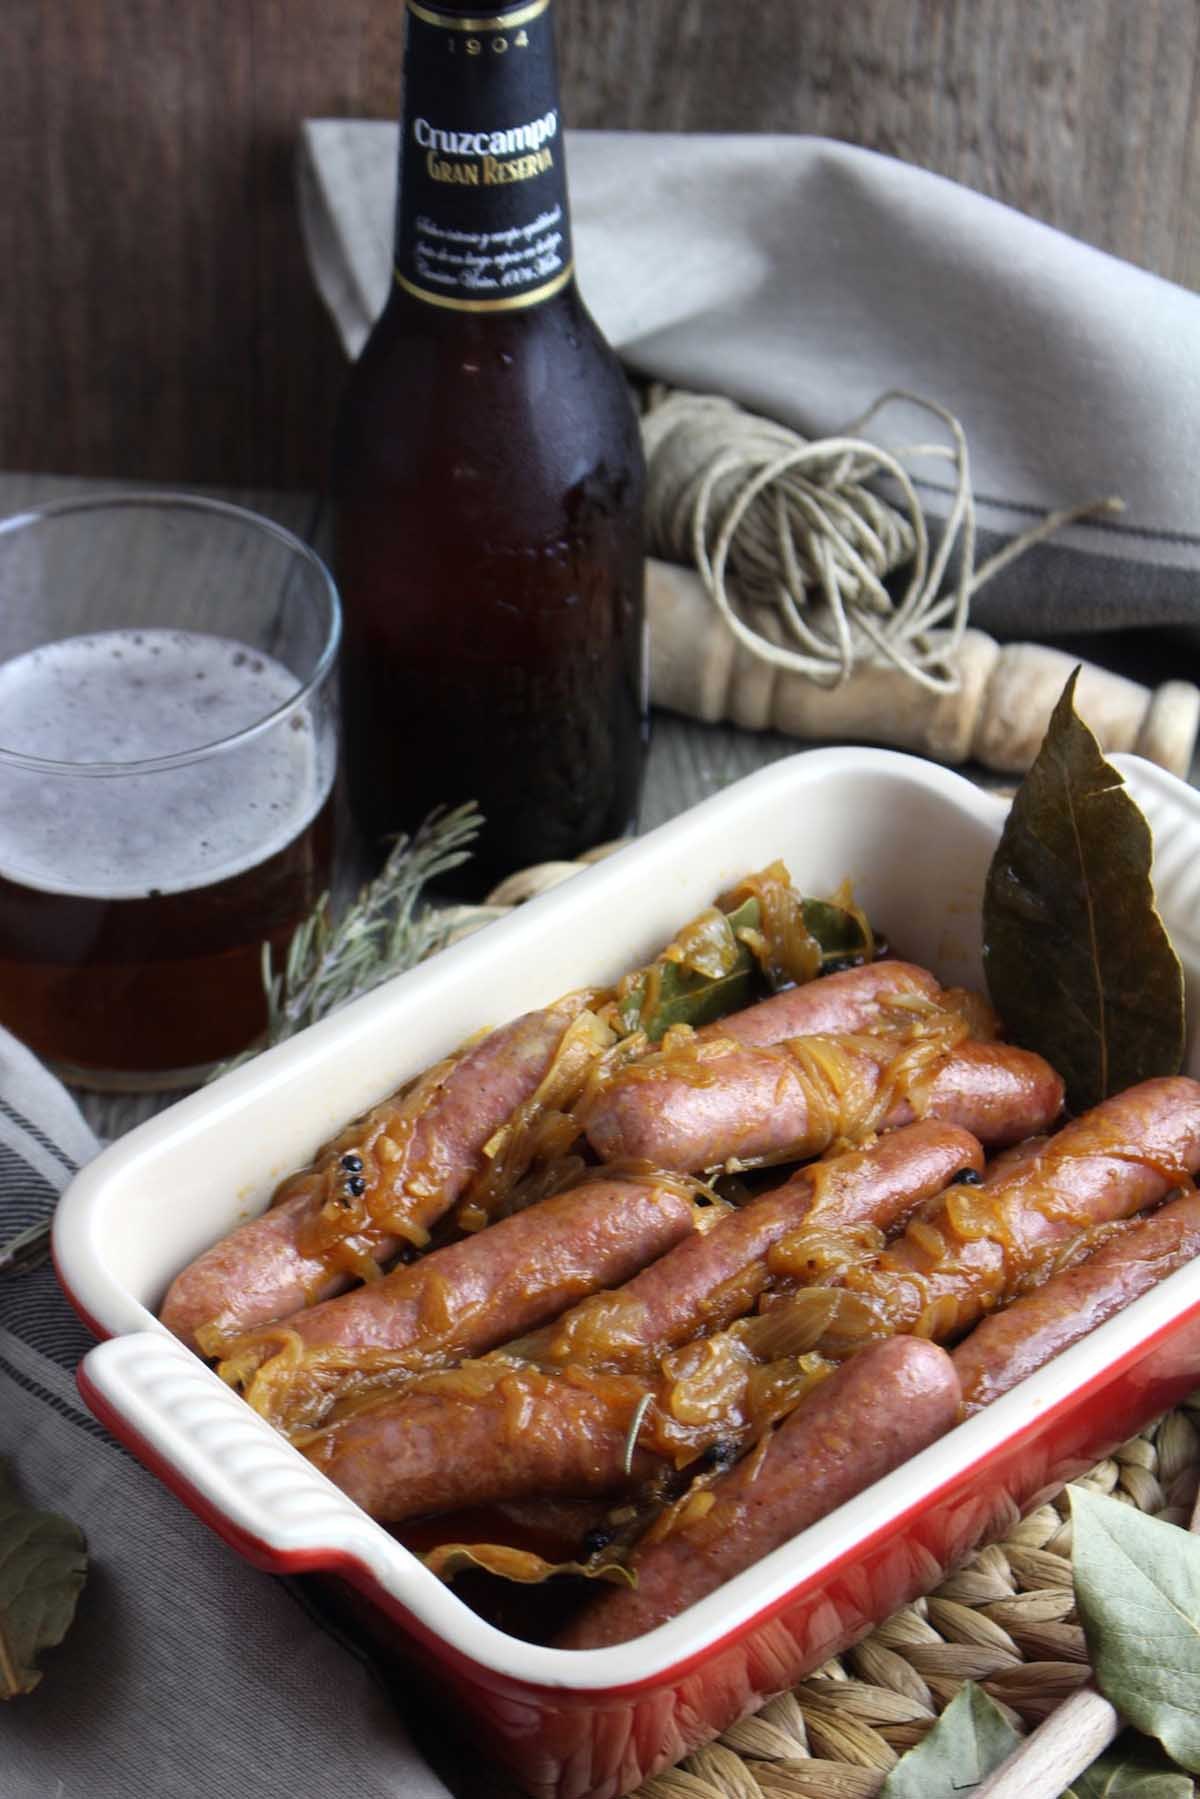 Salchichas a la cerveza con pimentón